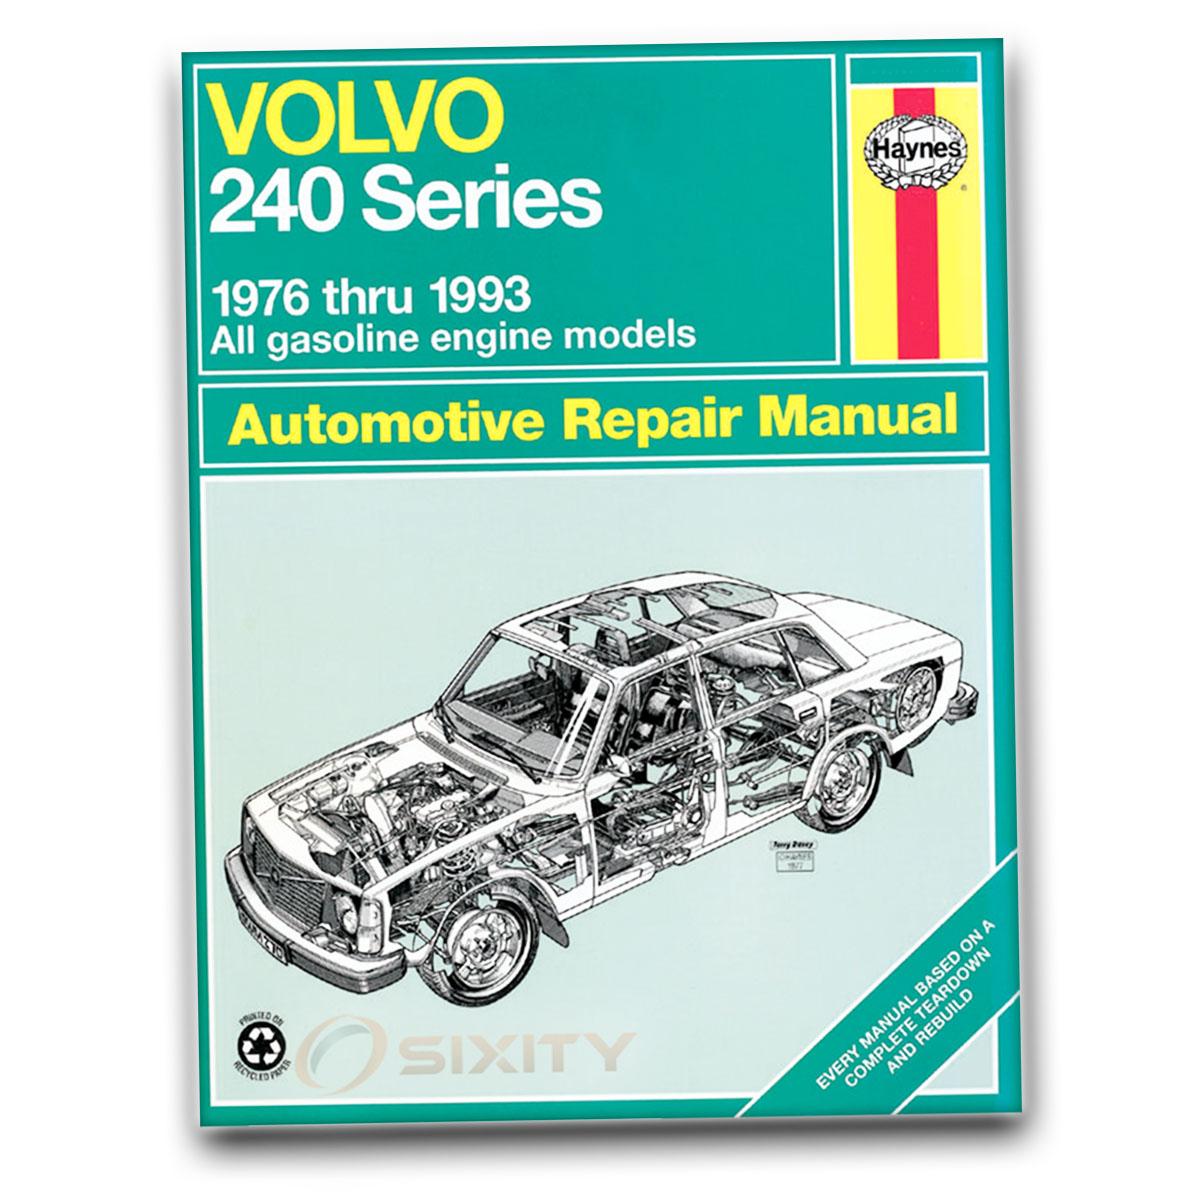 Shop Turbo Specific: Volvo 242 Haynes Repair Manual DL GL GLT Turbo Base Shop